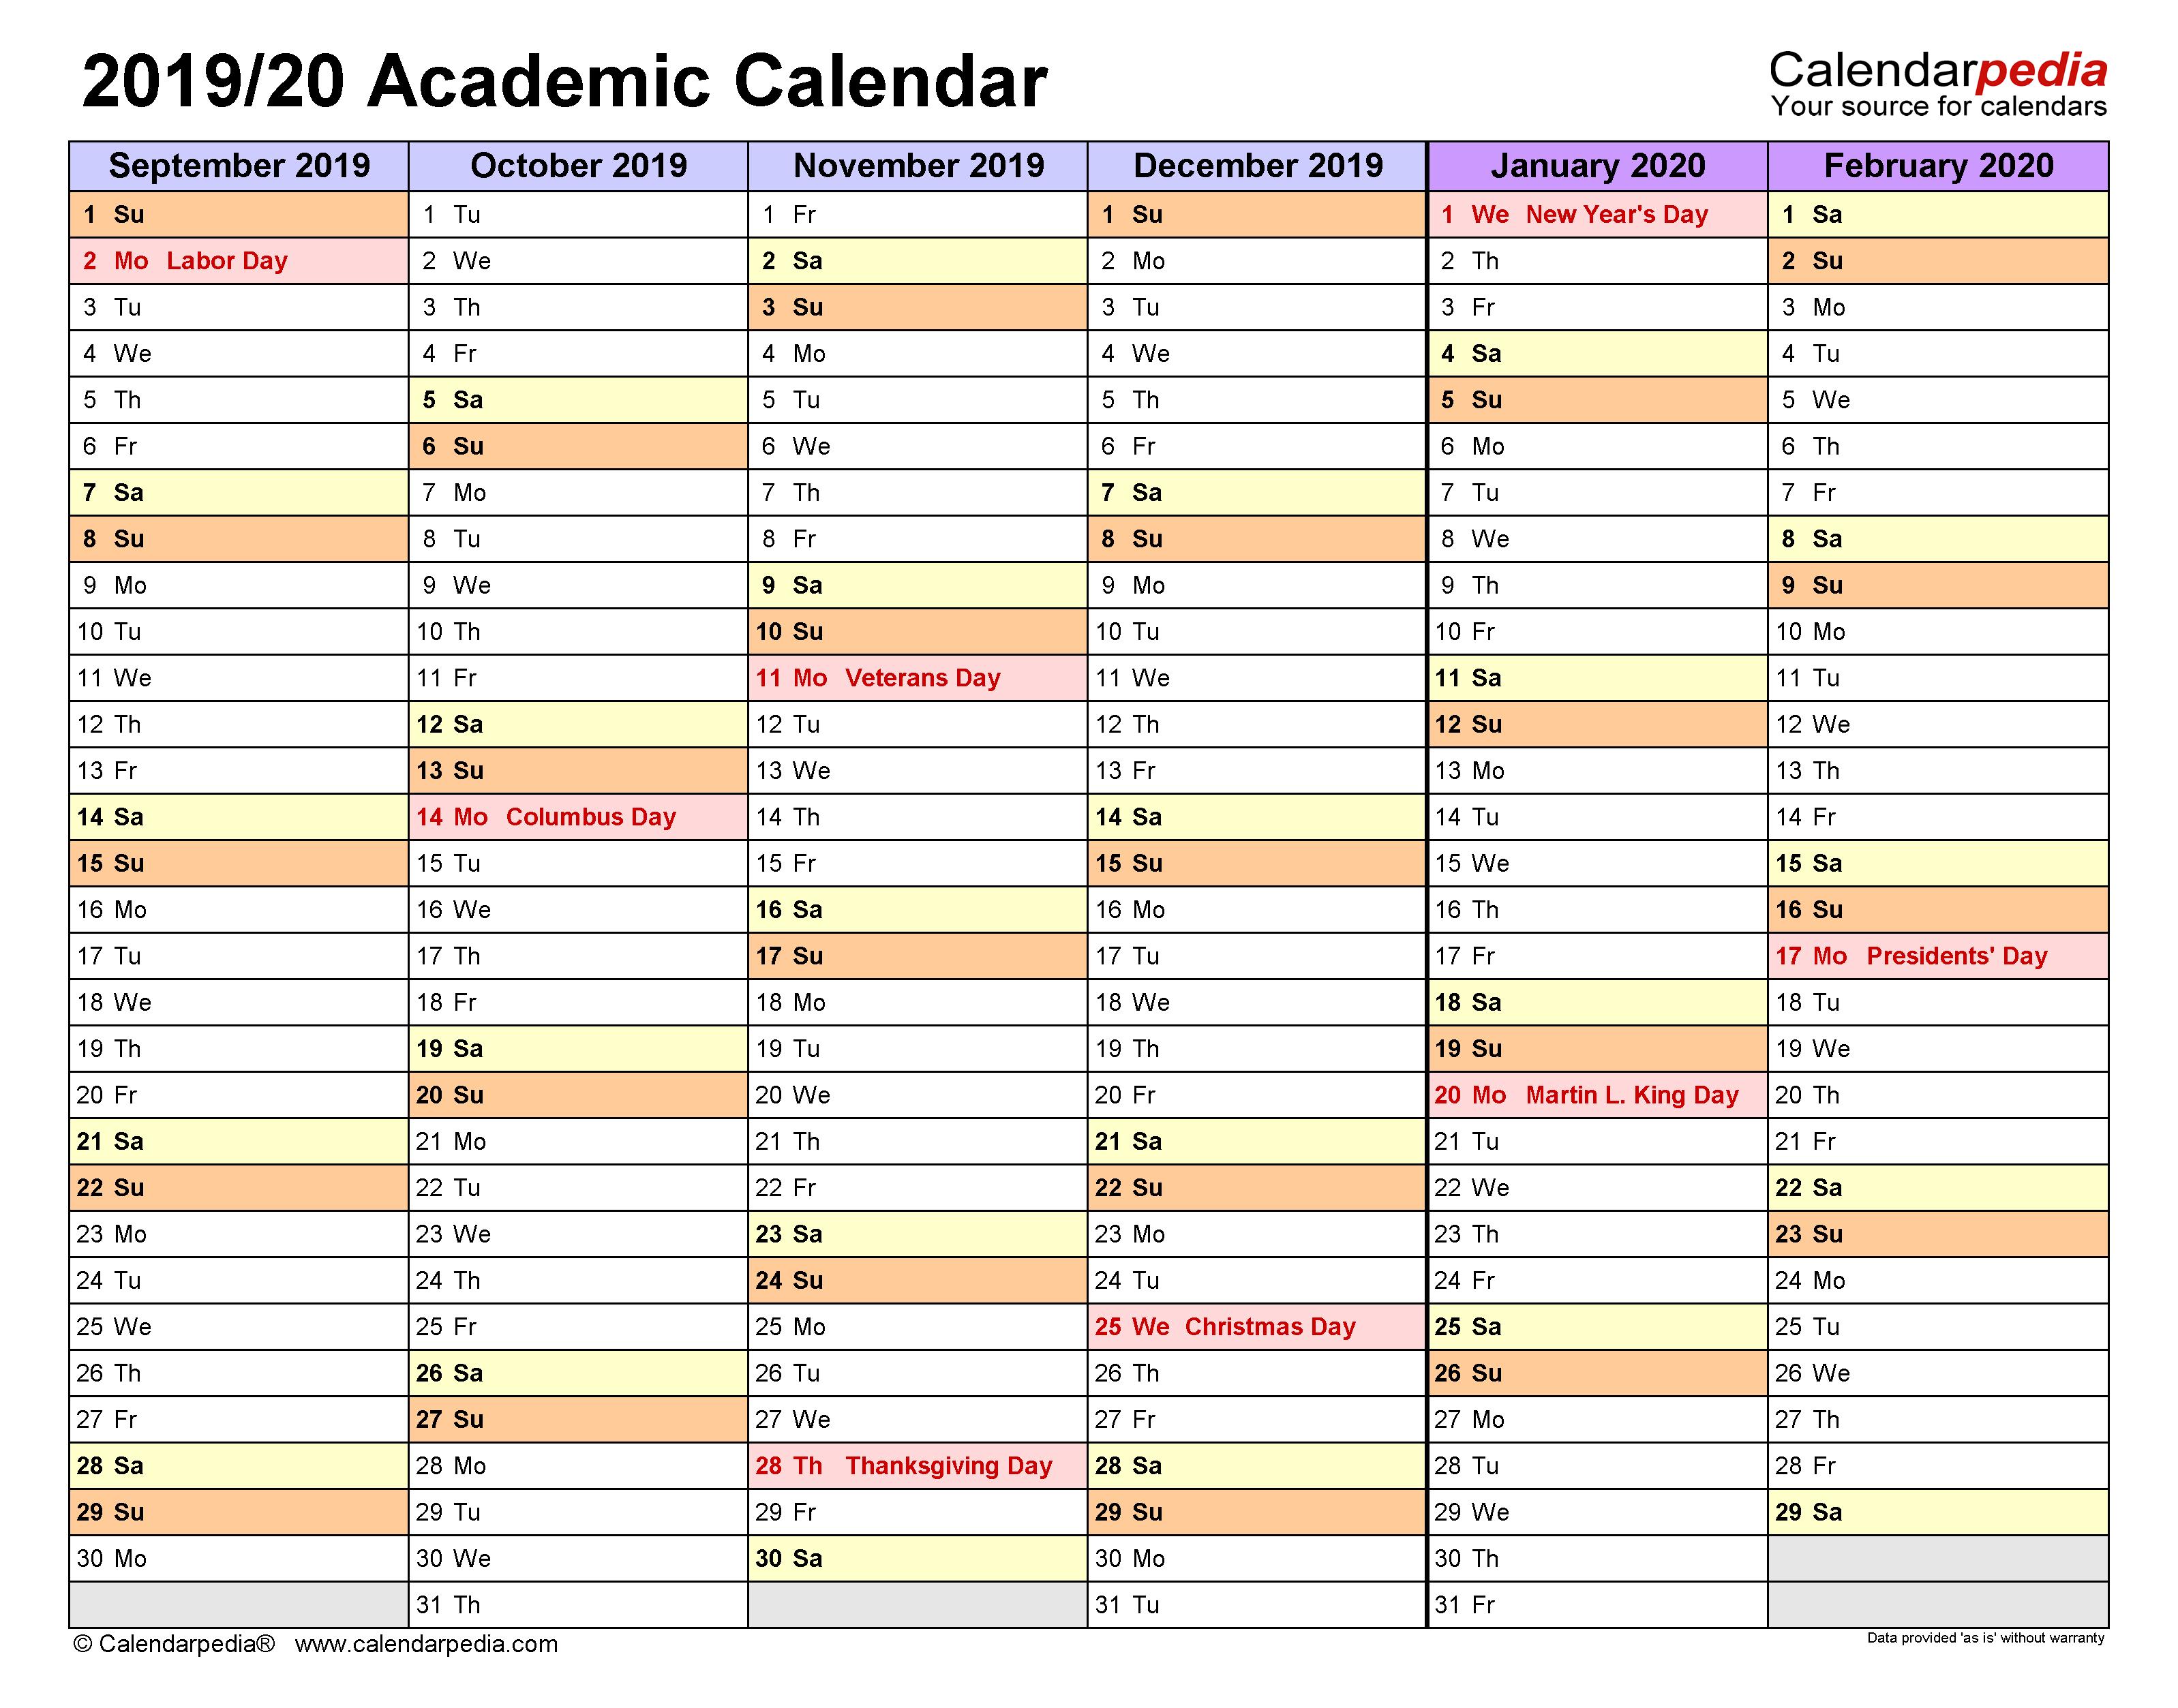 Amherst College Academic Calendar 2021 2022 | Calendar 2021